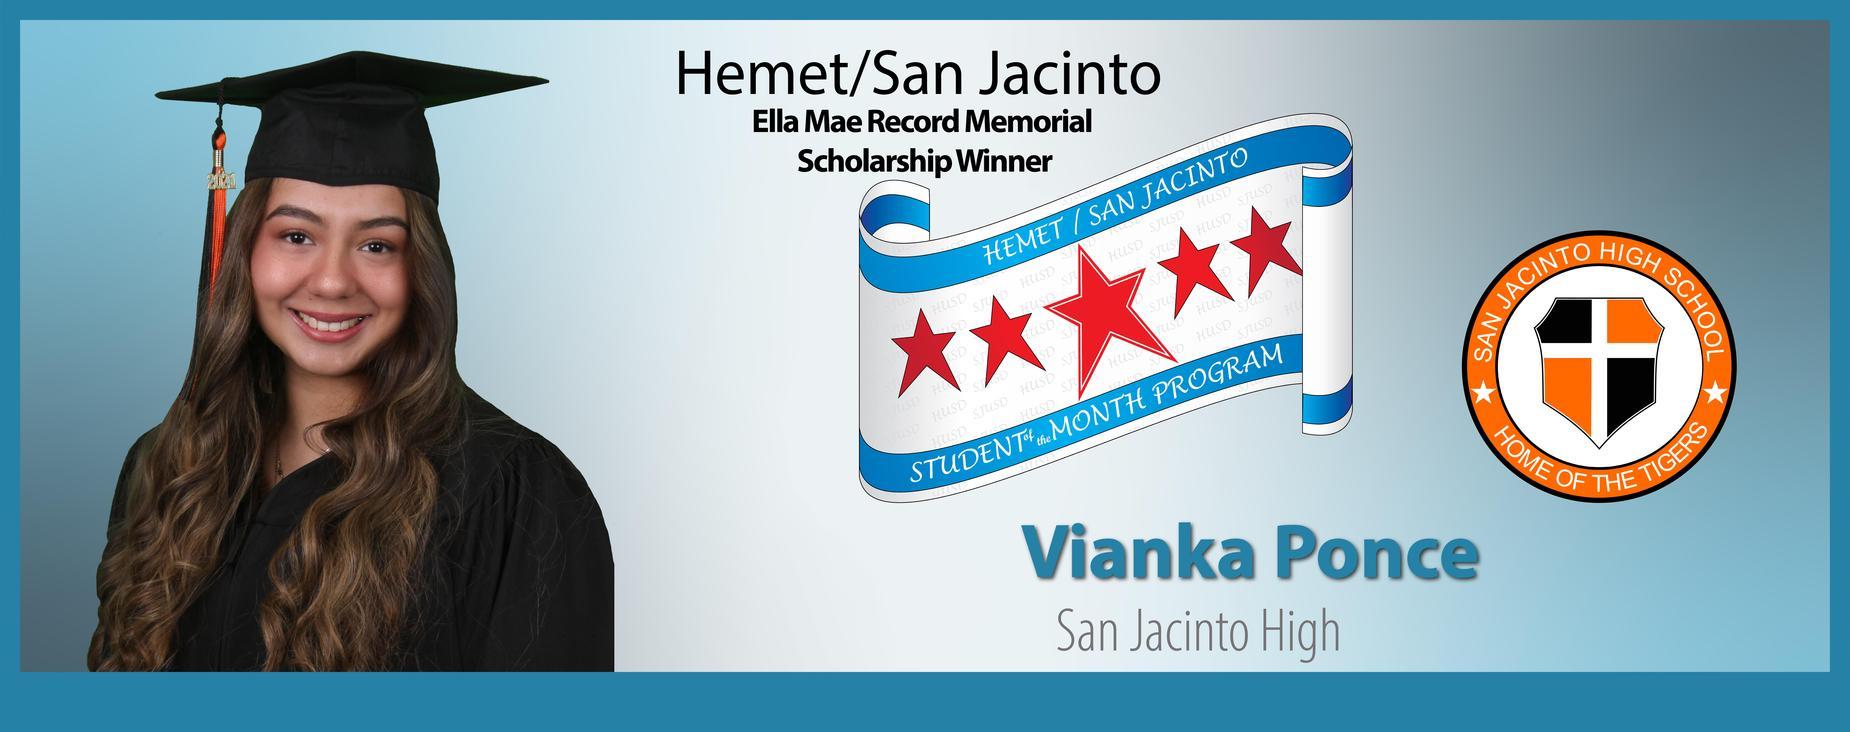 Vianka Ponce Scholarship Winner